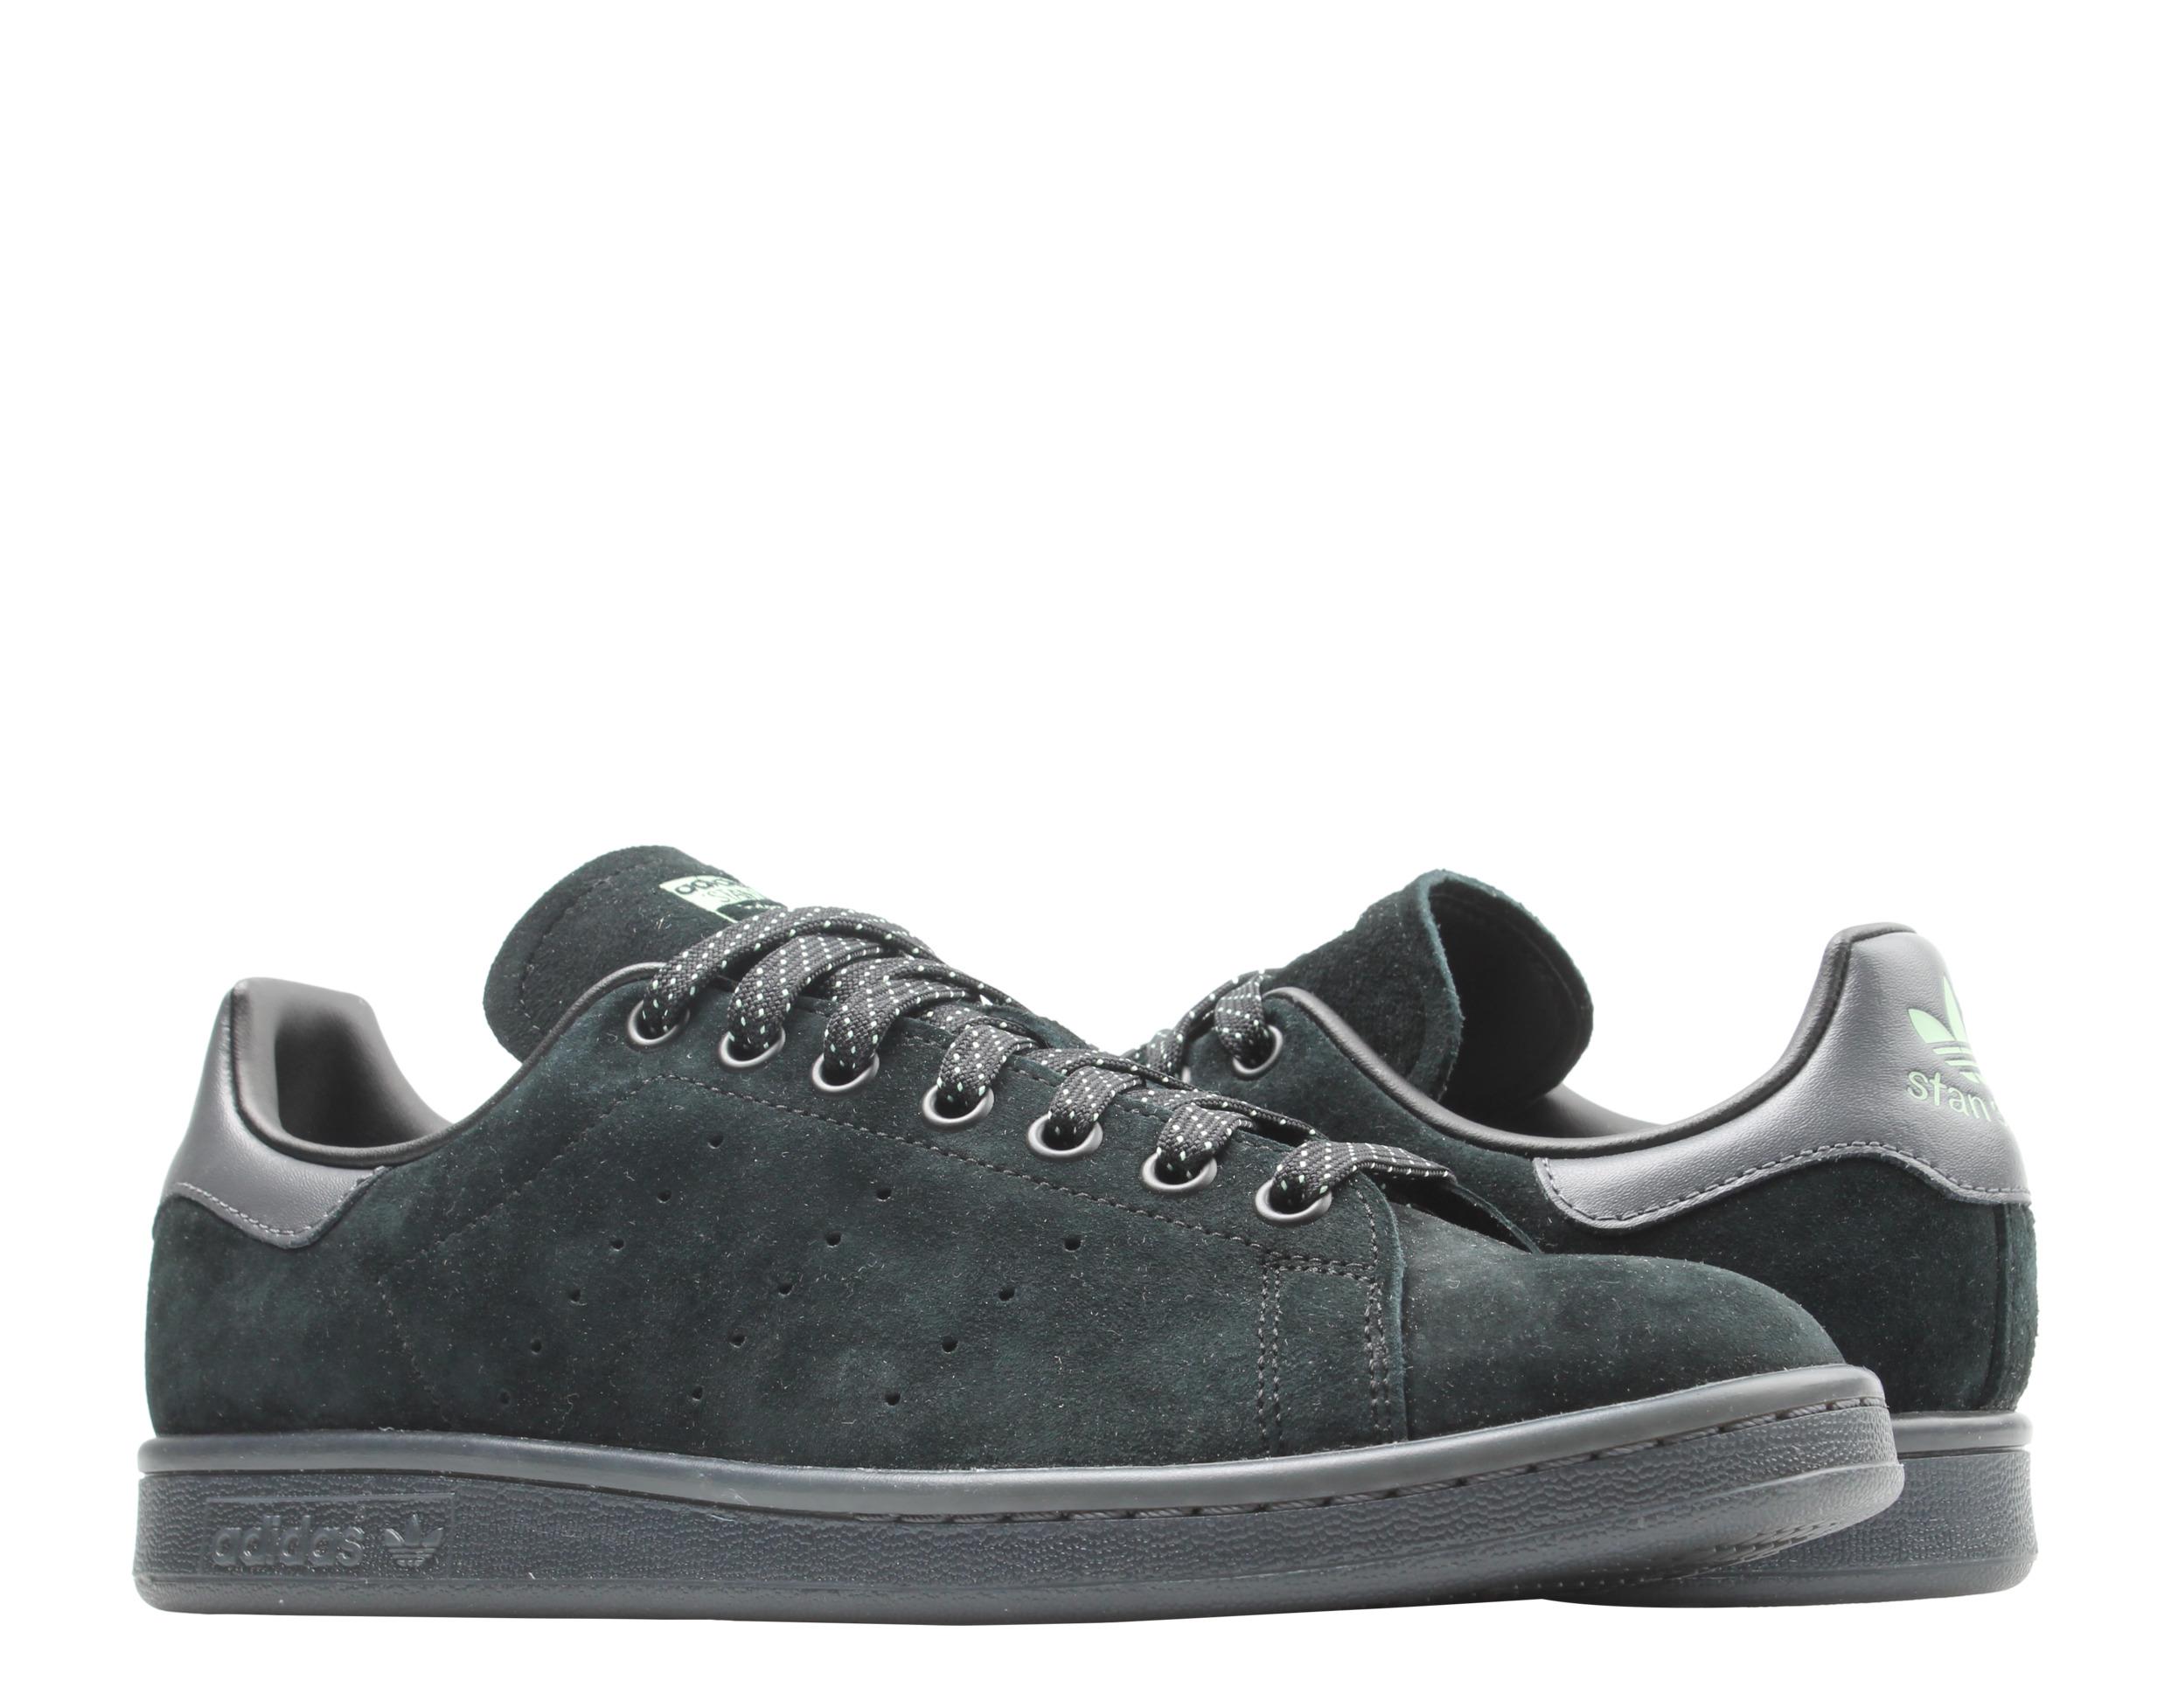 Details about Adidas Originals Stan Smith Core Black/Blush Green Men's Tennis Shoes FW2640